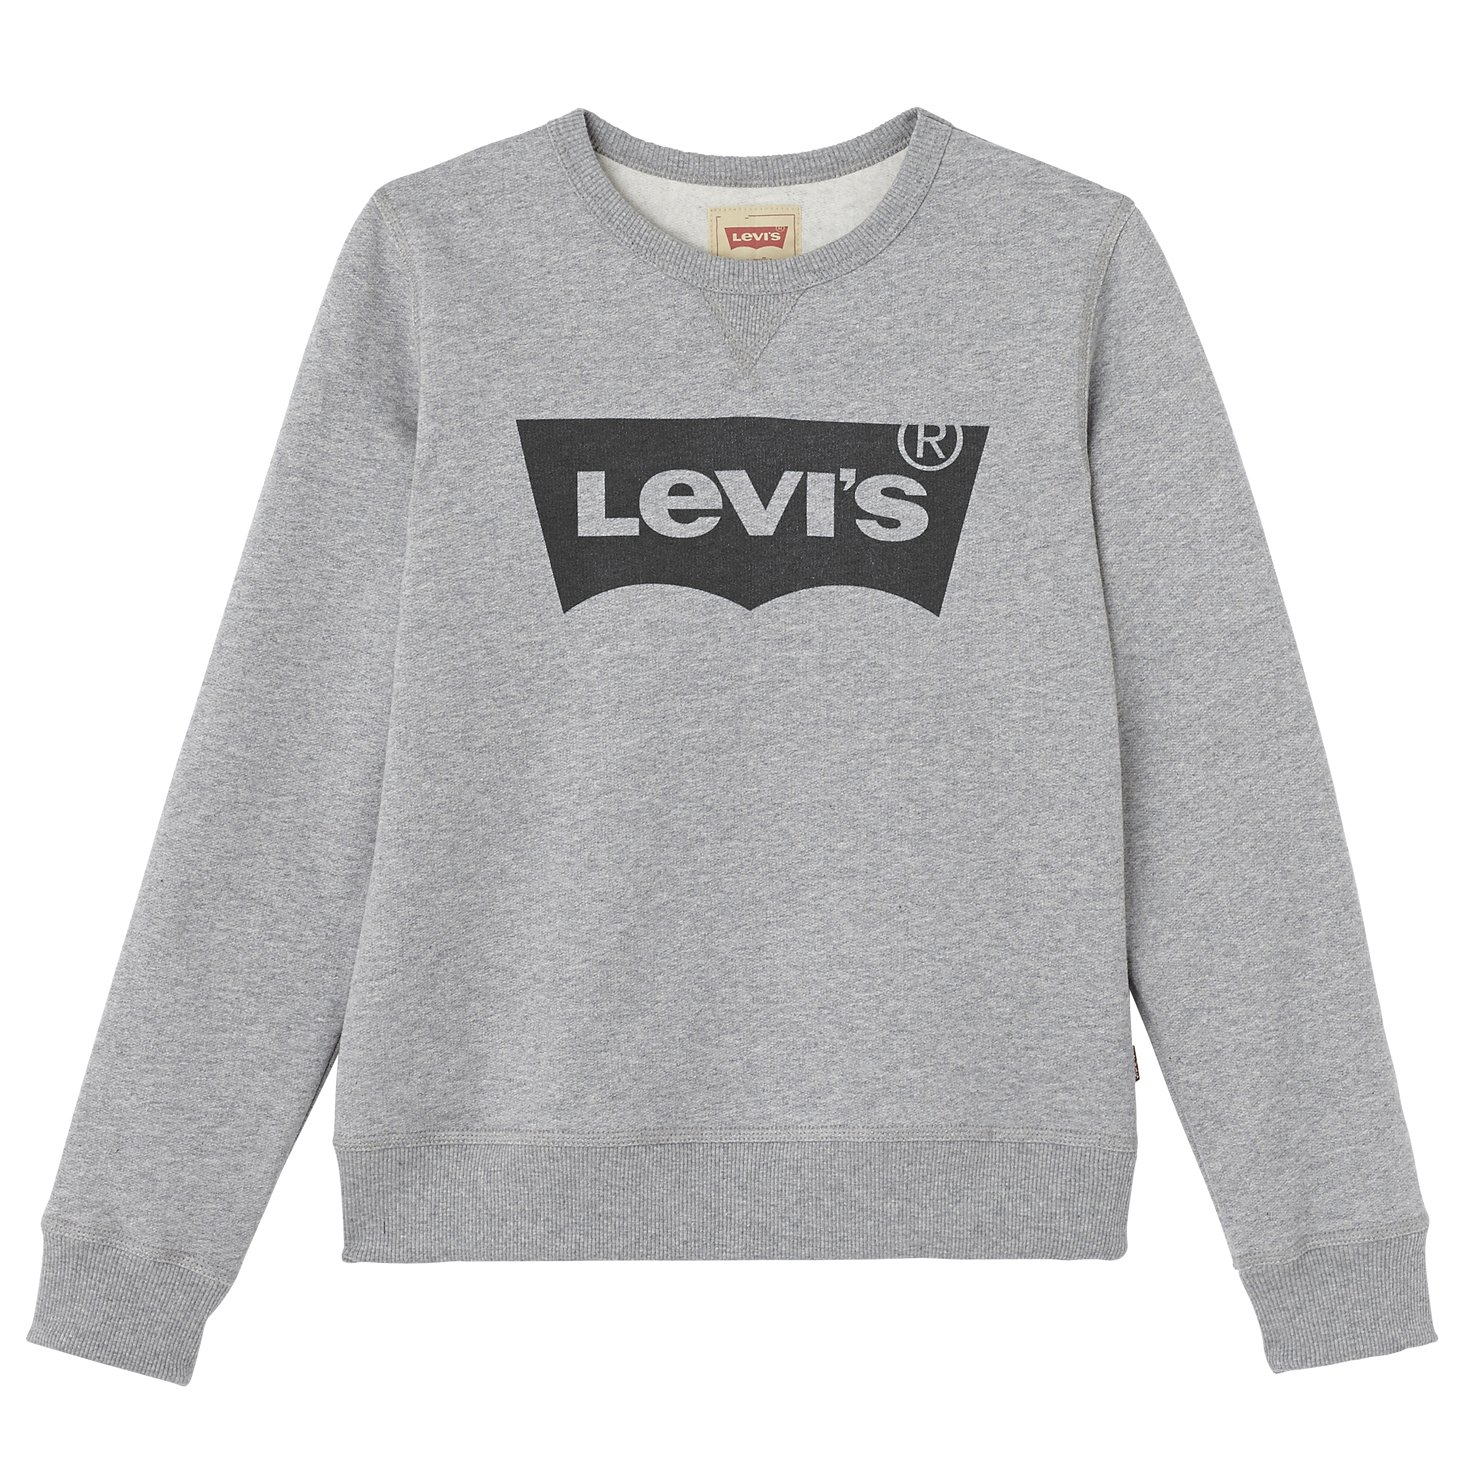 Levi's Kids Batwin Sweatshirt, Felpa Bambino Levi' s Kids N91500J